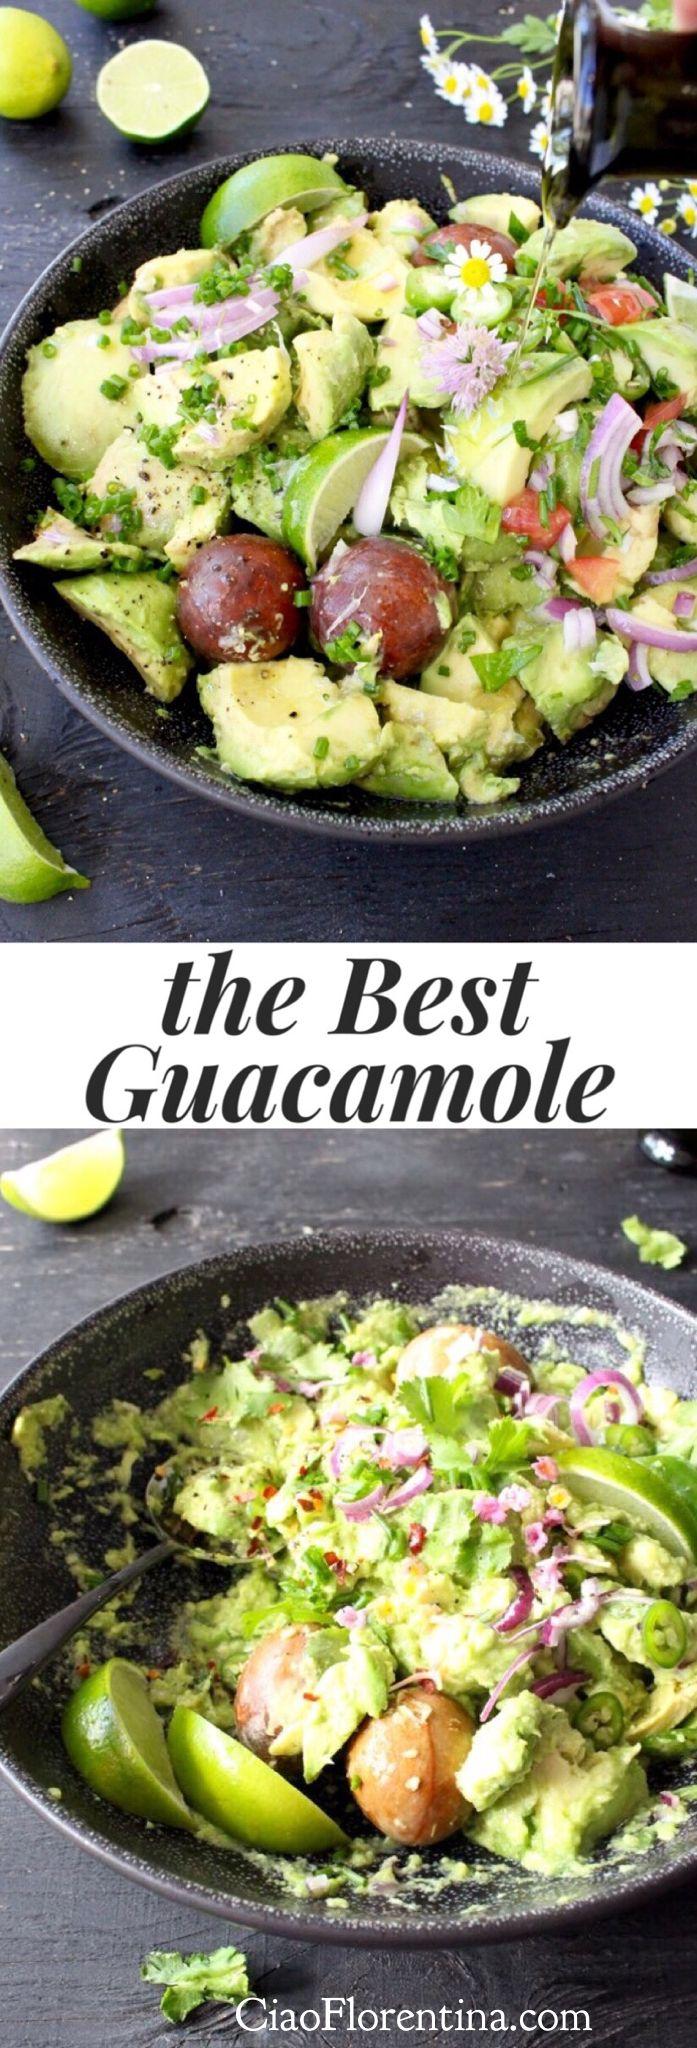 The Best Simple Homemade Guacamole Recipe   | CiaoFlorentina.com @CiaoFlorentina